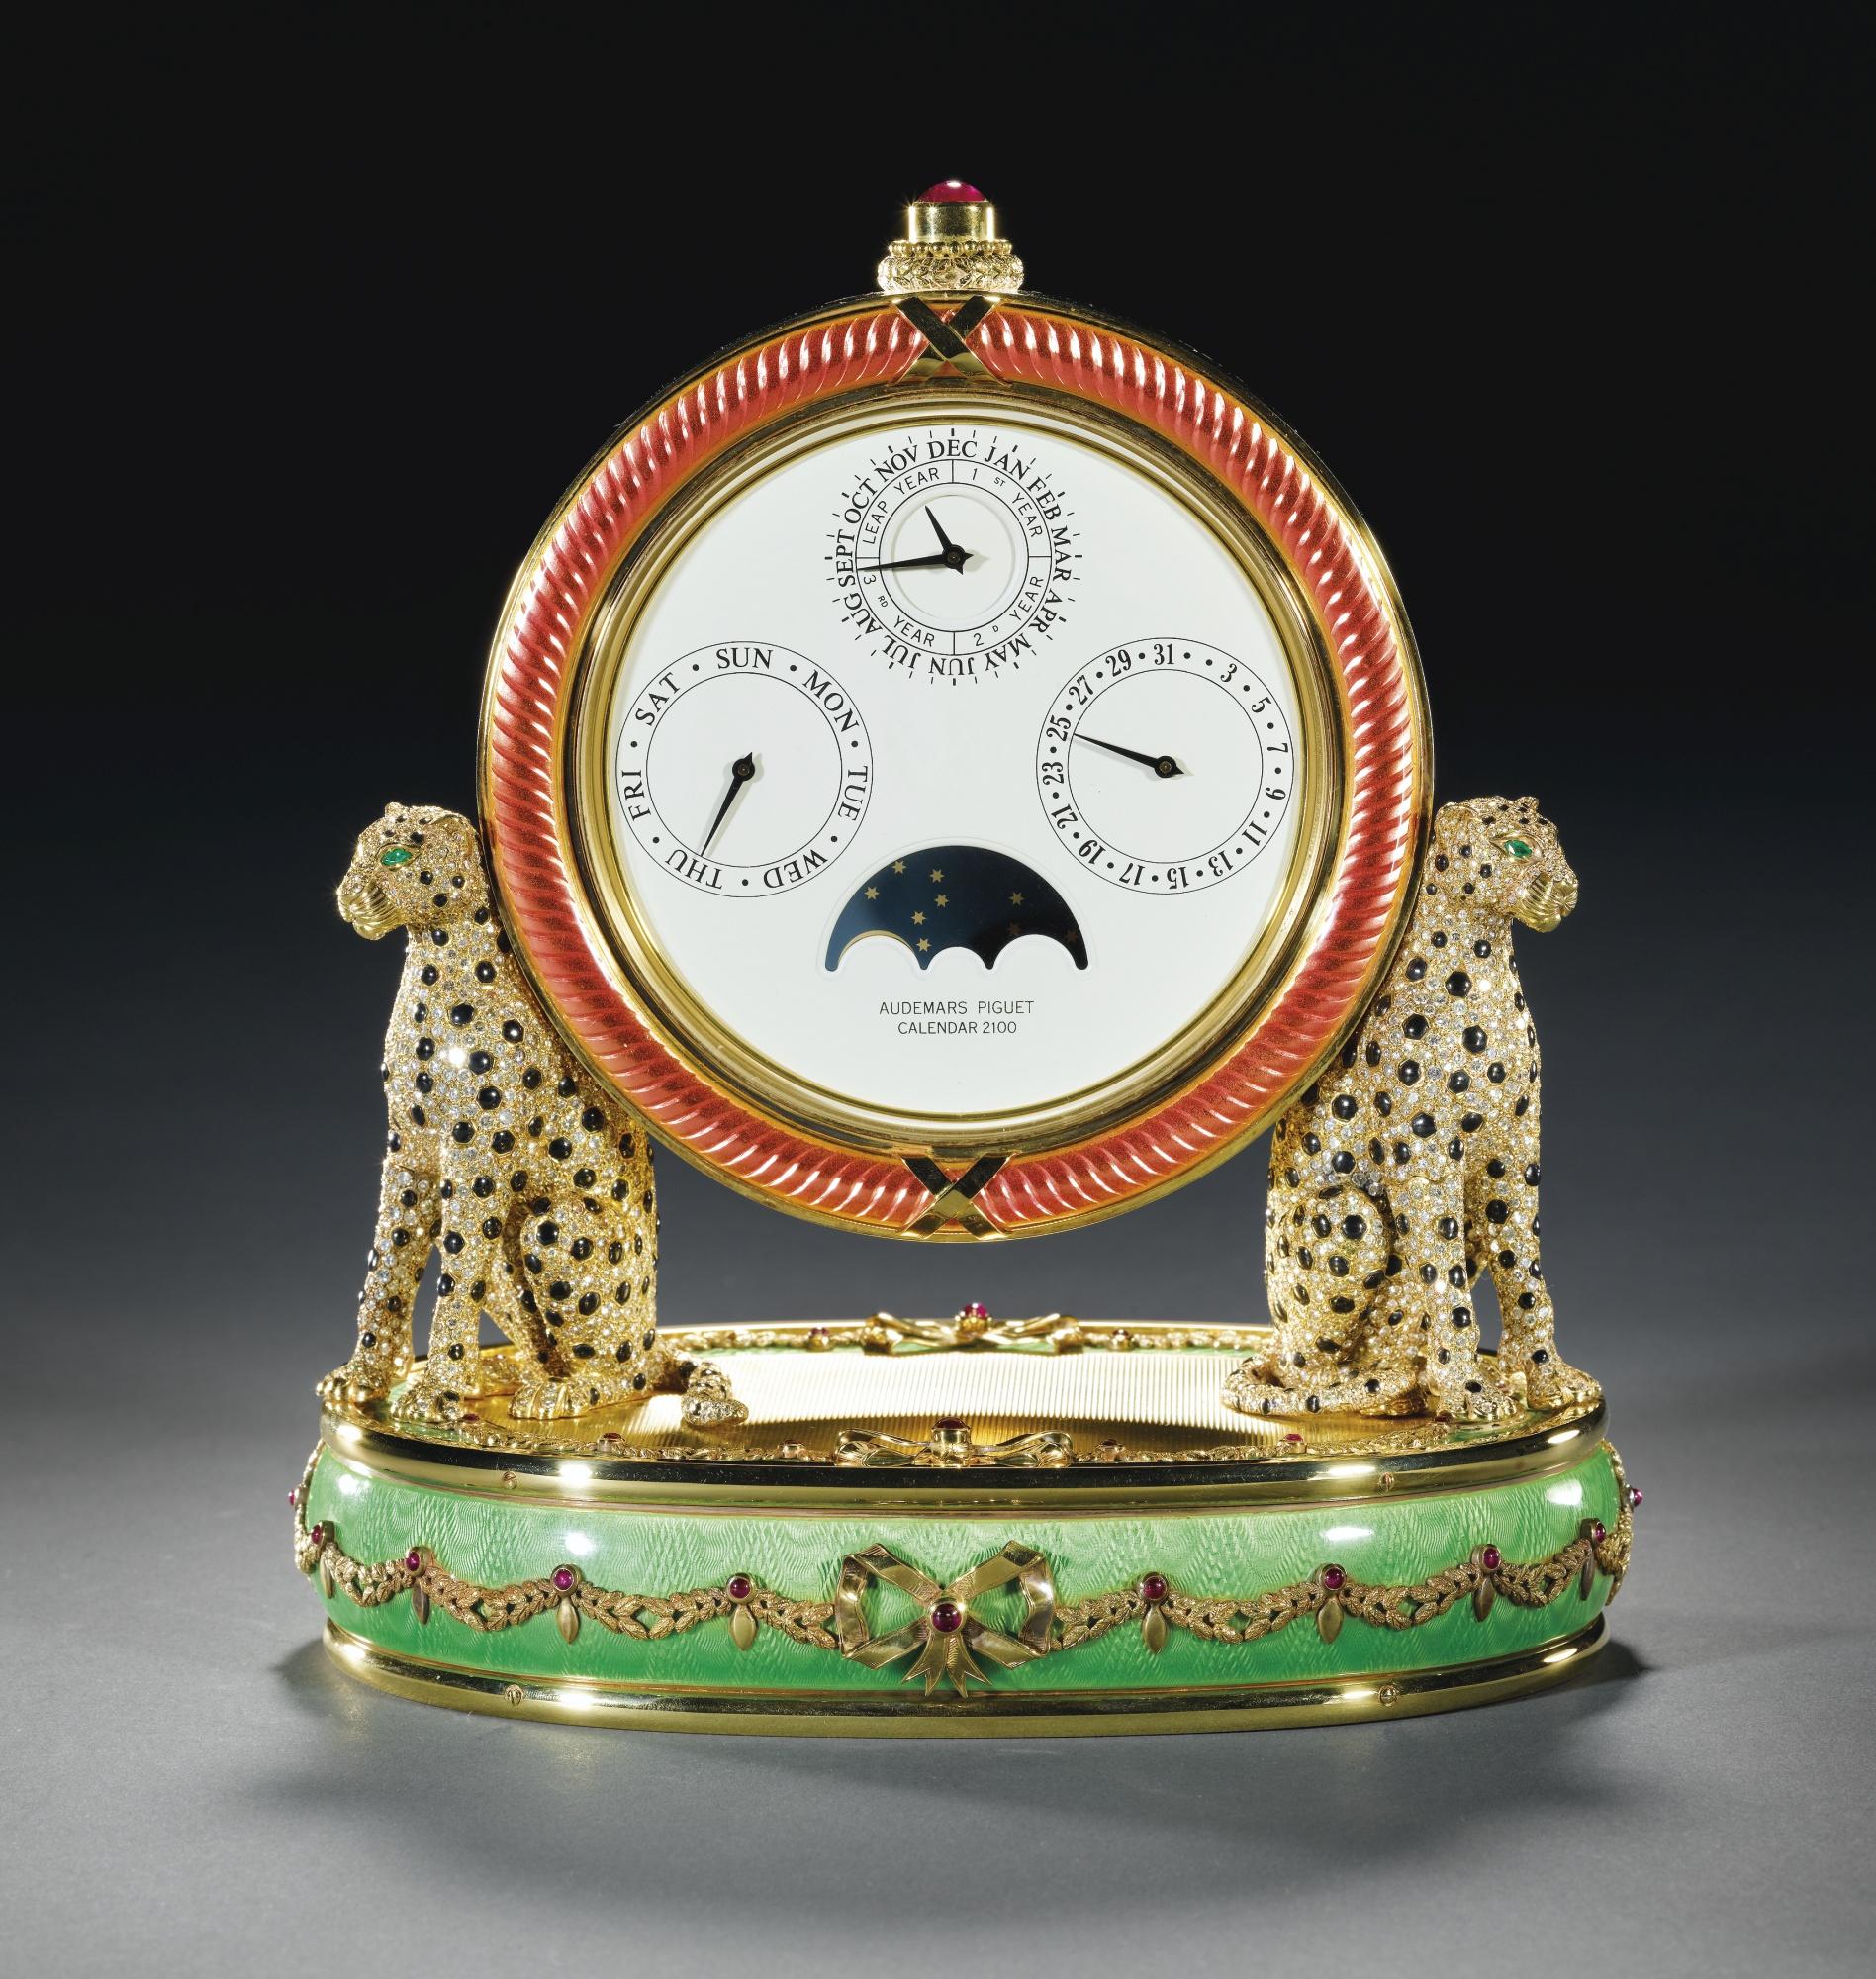 Audemars Piguet Pair of Cheetahs - Enamel Perpetual Calendar